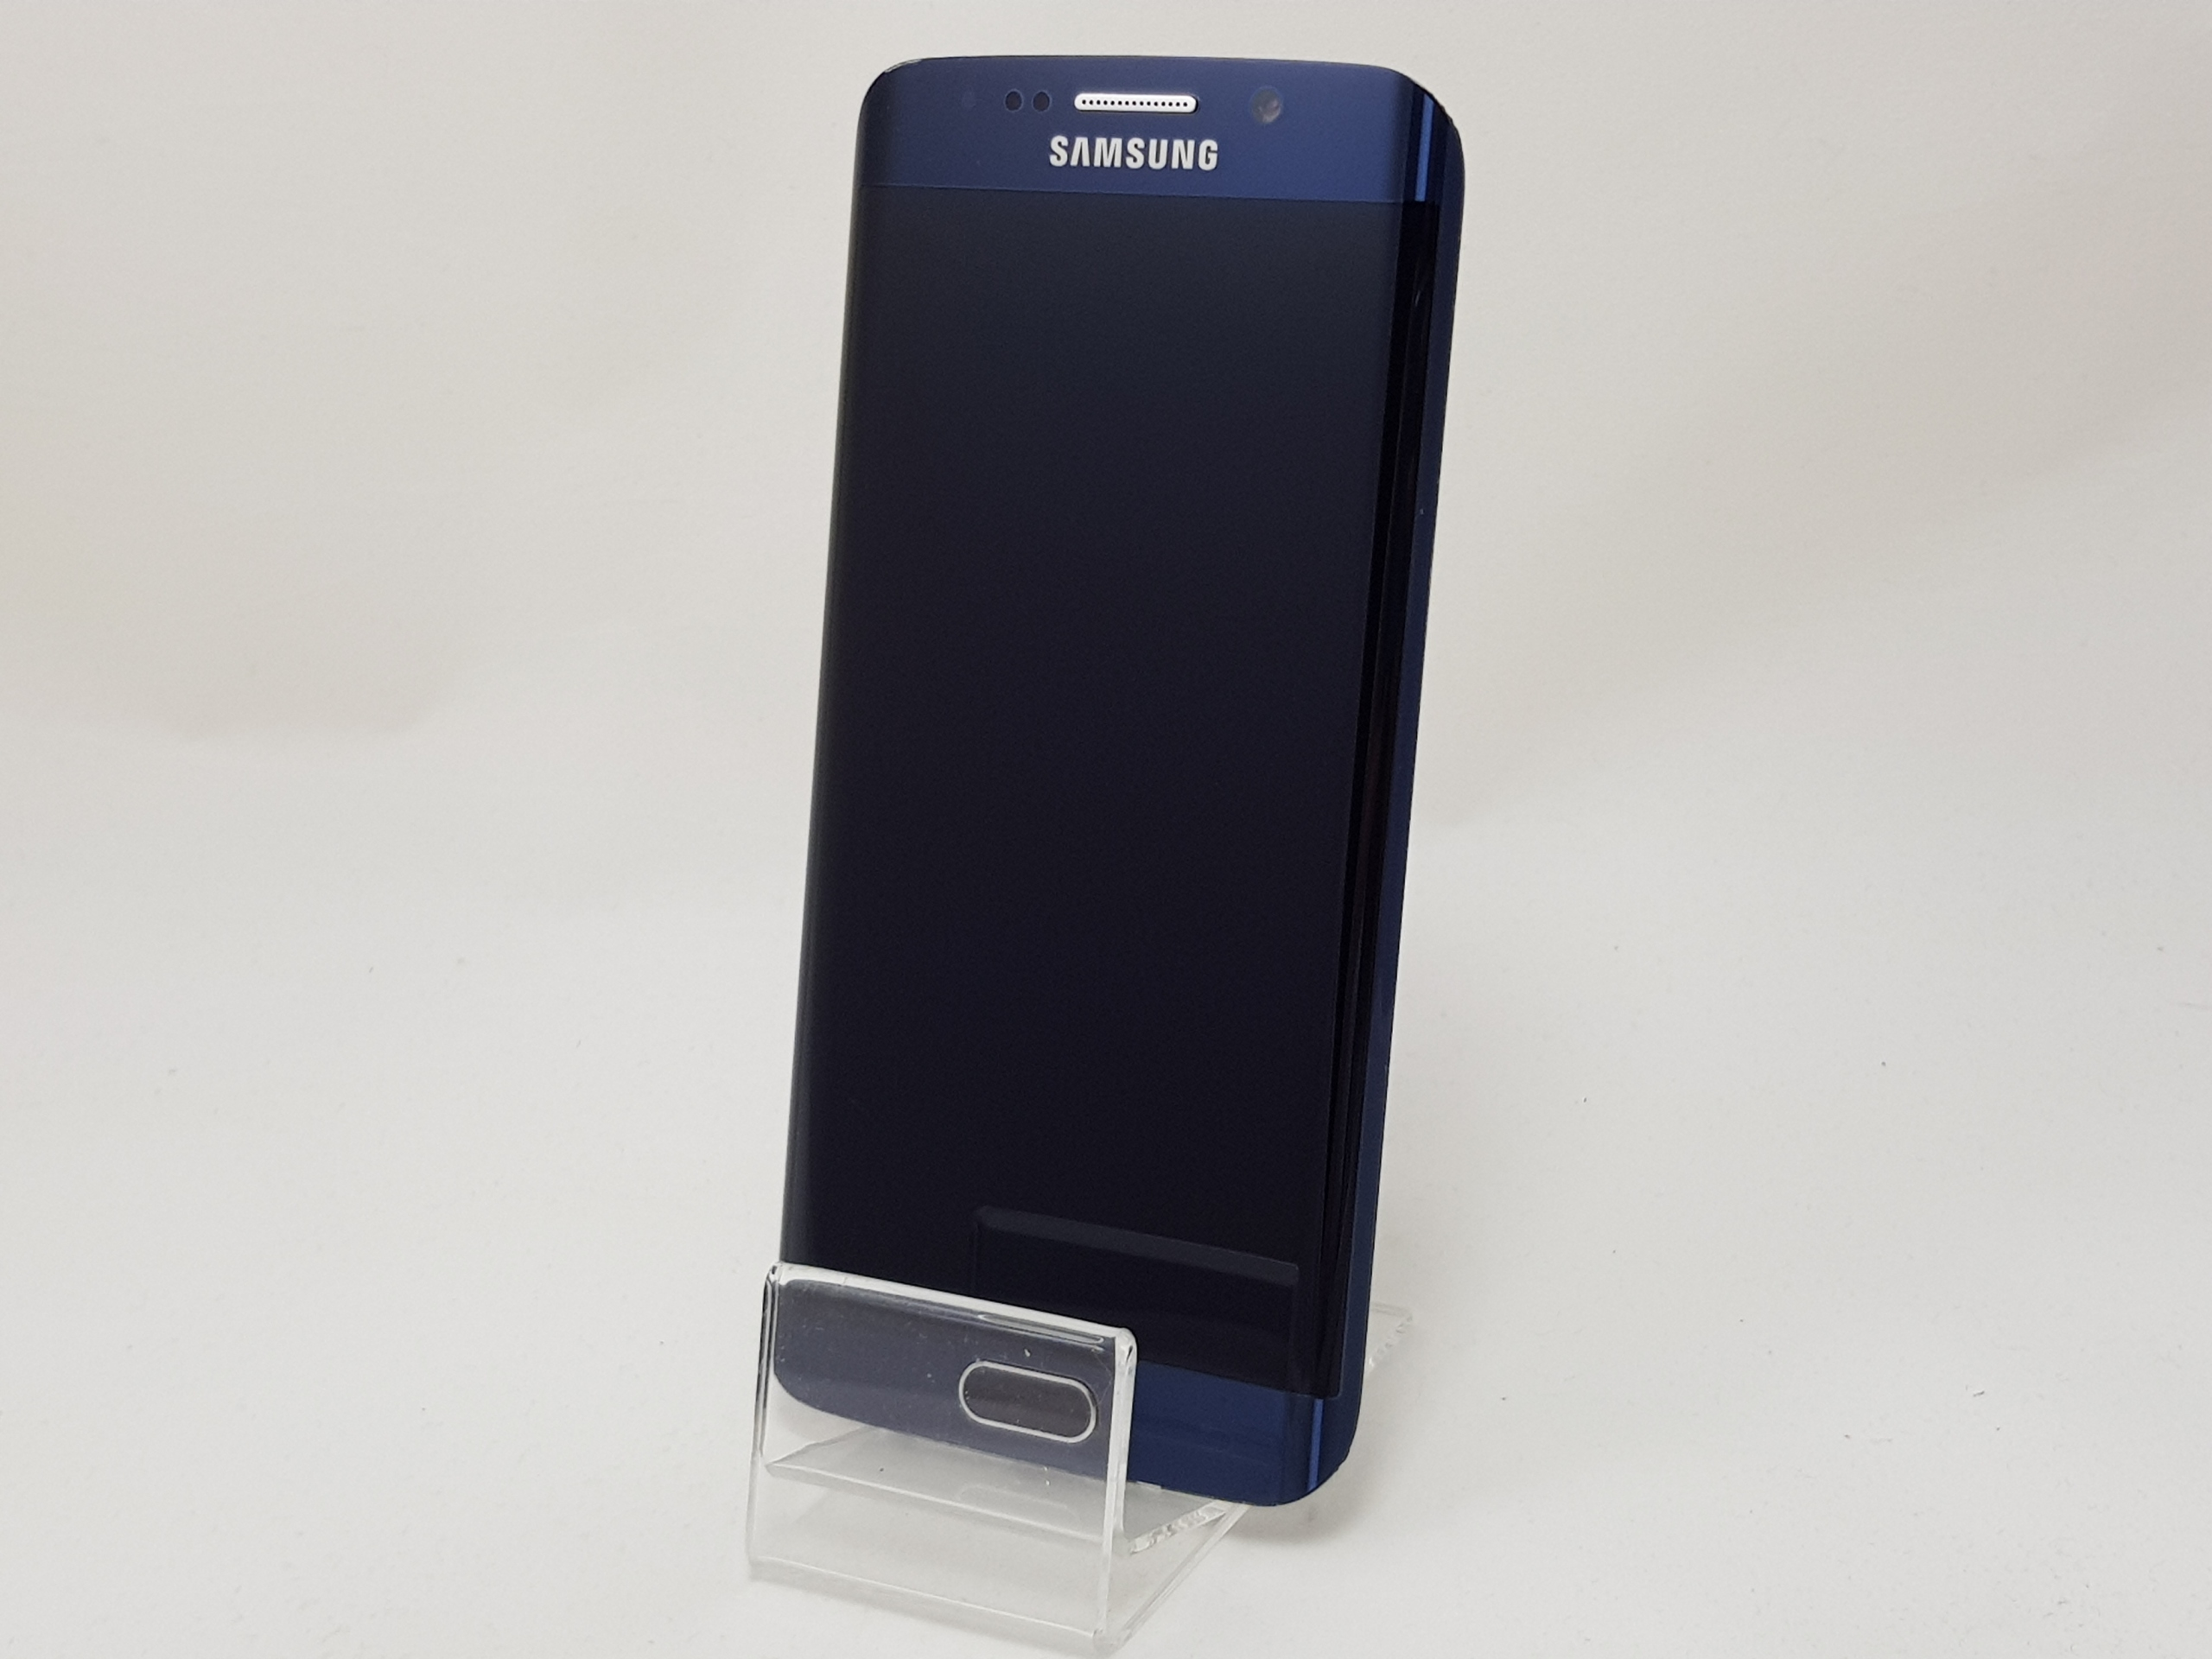 ORYG LCD SAMSUNG GALAXY S6 EDGE G925F WYŚWIET FV23